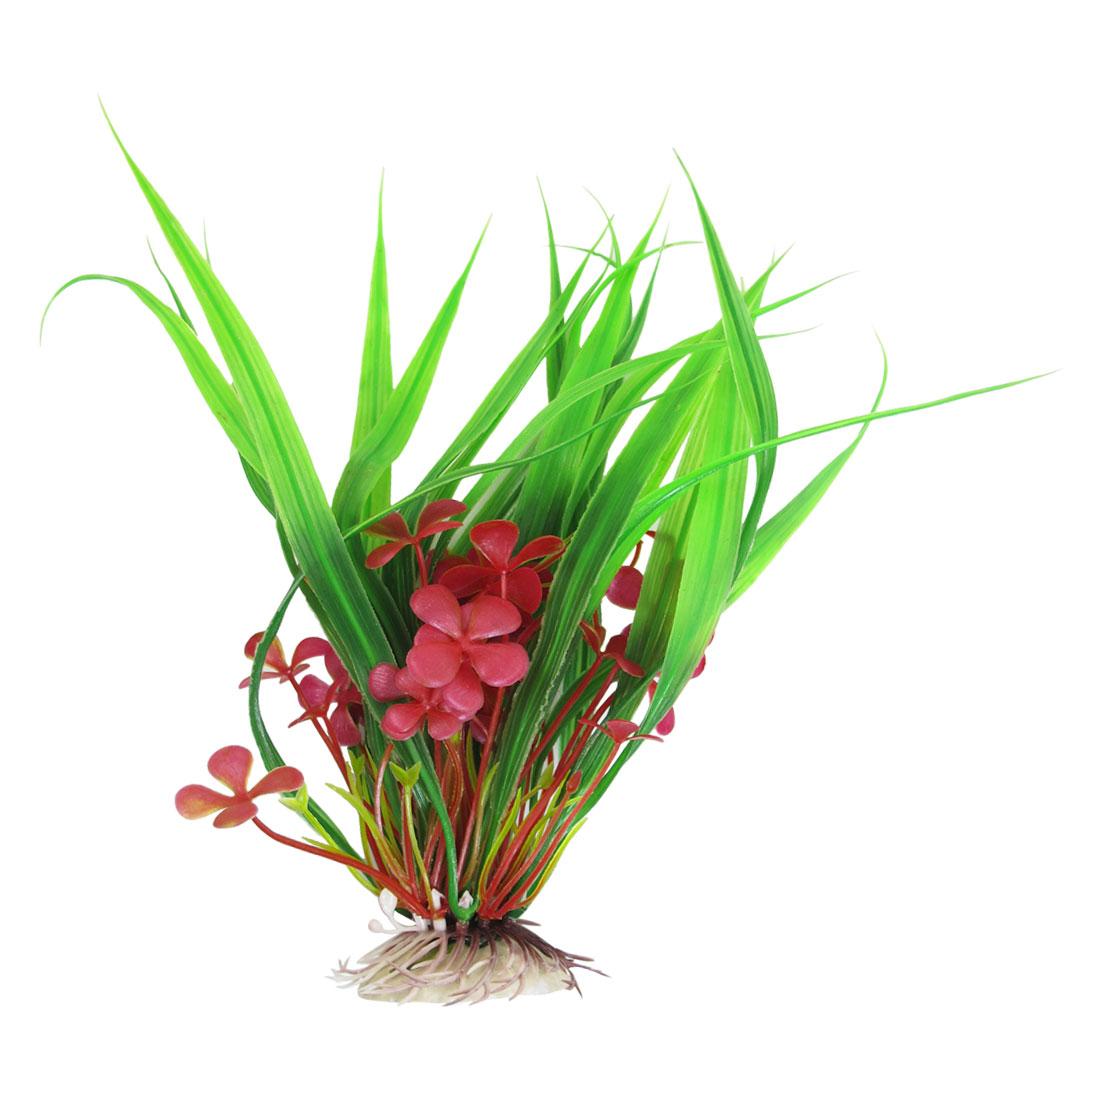 9-4-High-Red-Green-Simulation-Fish-Tank-Aquarium-Plastic-Plants-Landscaping